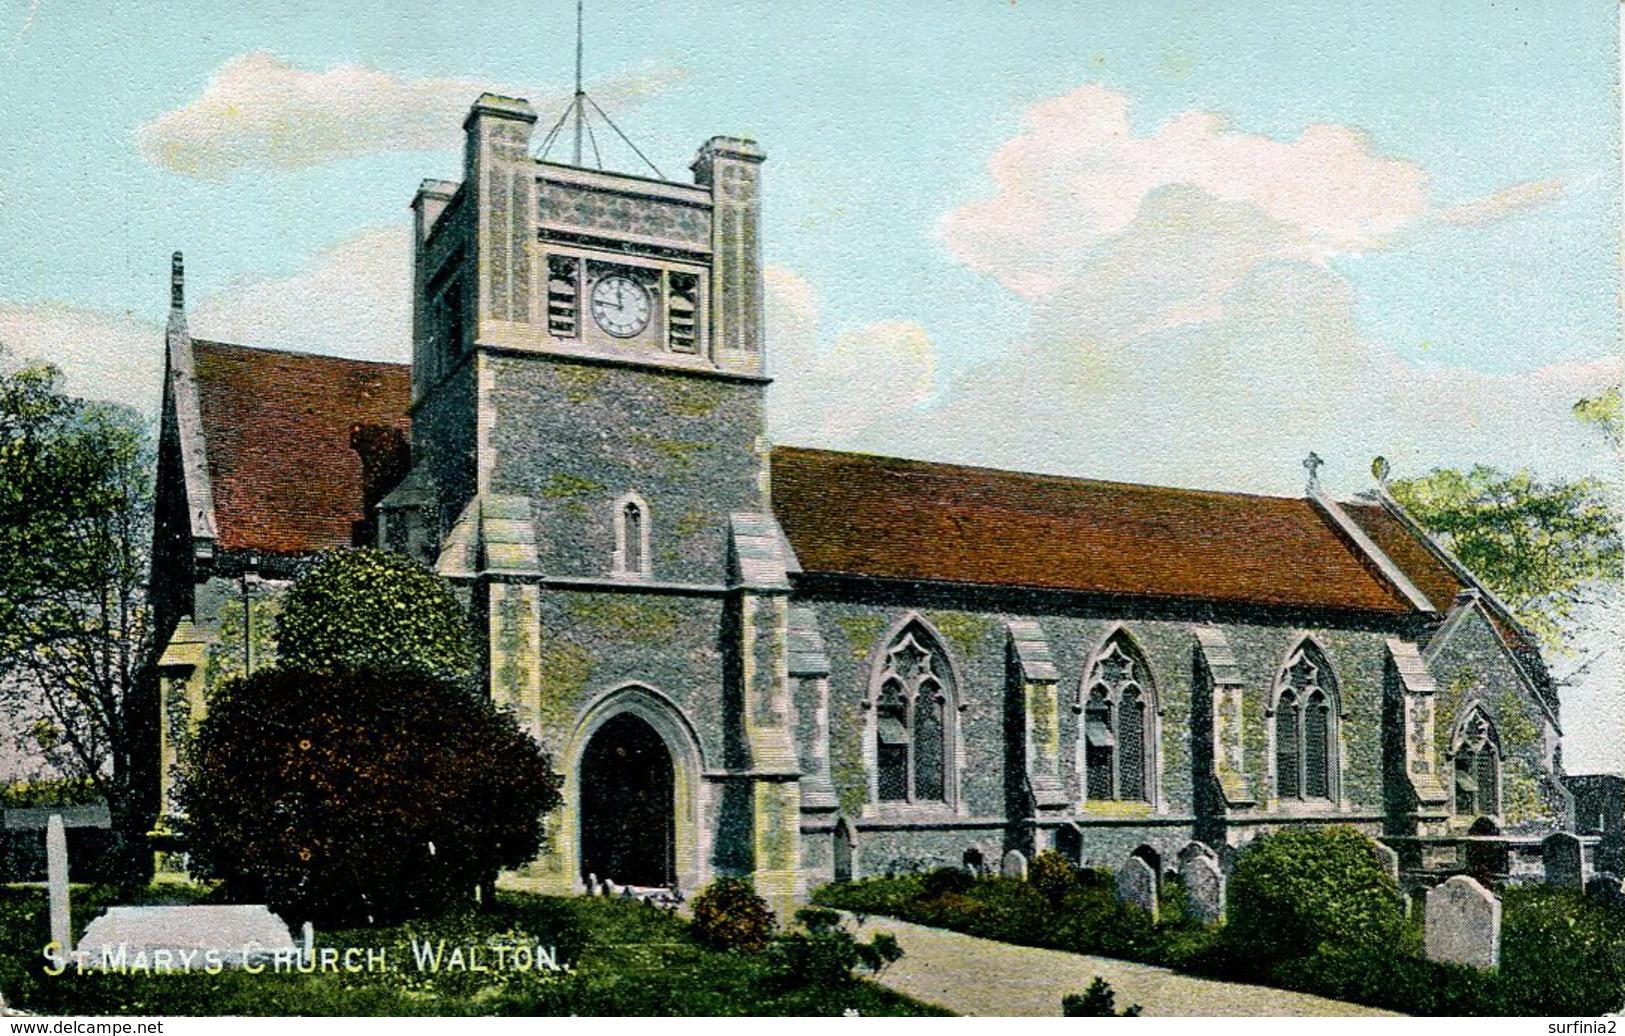 SUFFOLK - WALTON - ST MARY'S CHURCH  Suf327 - England